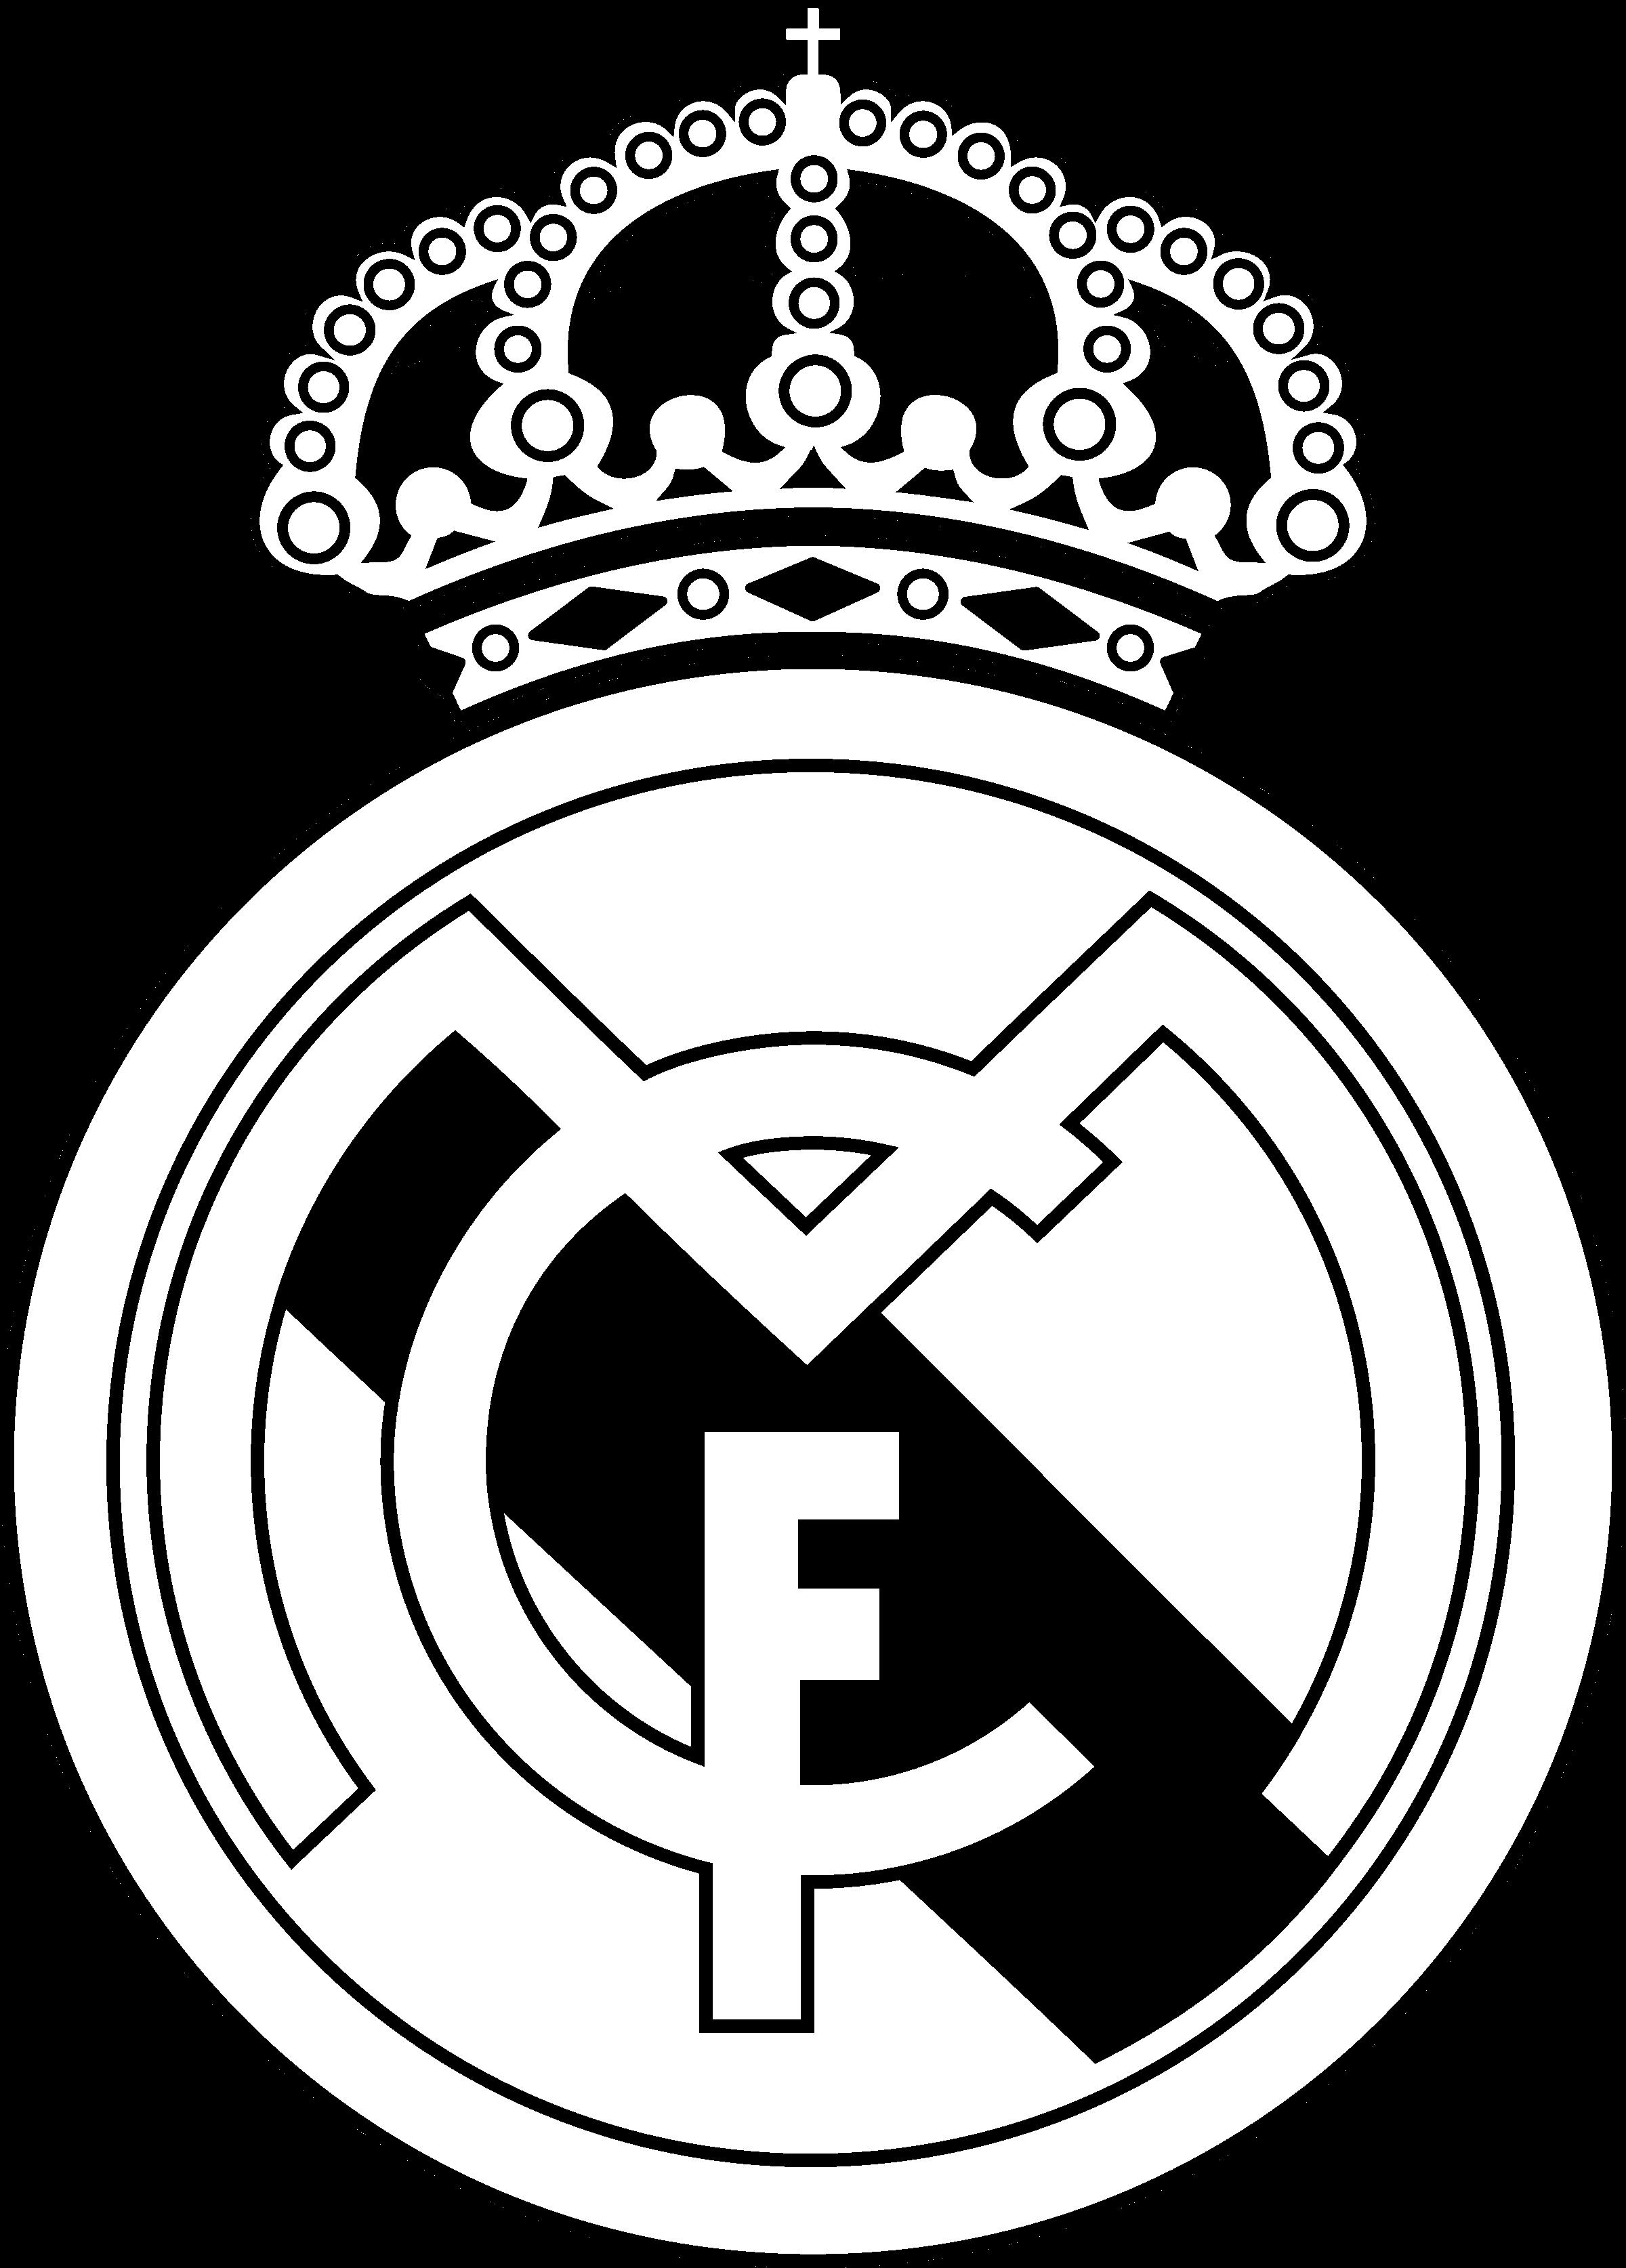 Real Madrid Png Full Hd Vector Real Madrid Logo 2400x3348 Download Hd Wallpaper Wallpapertip